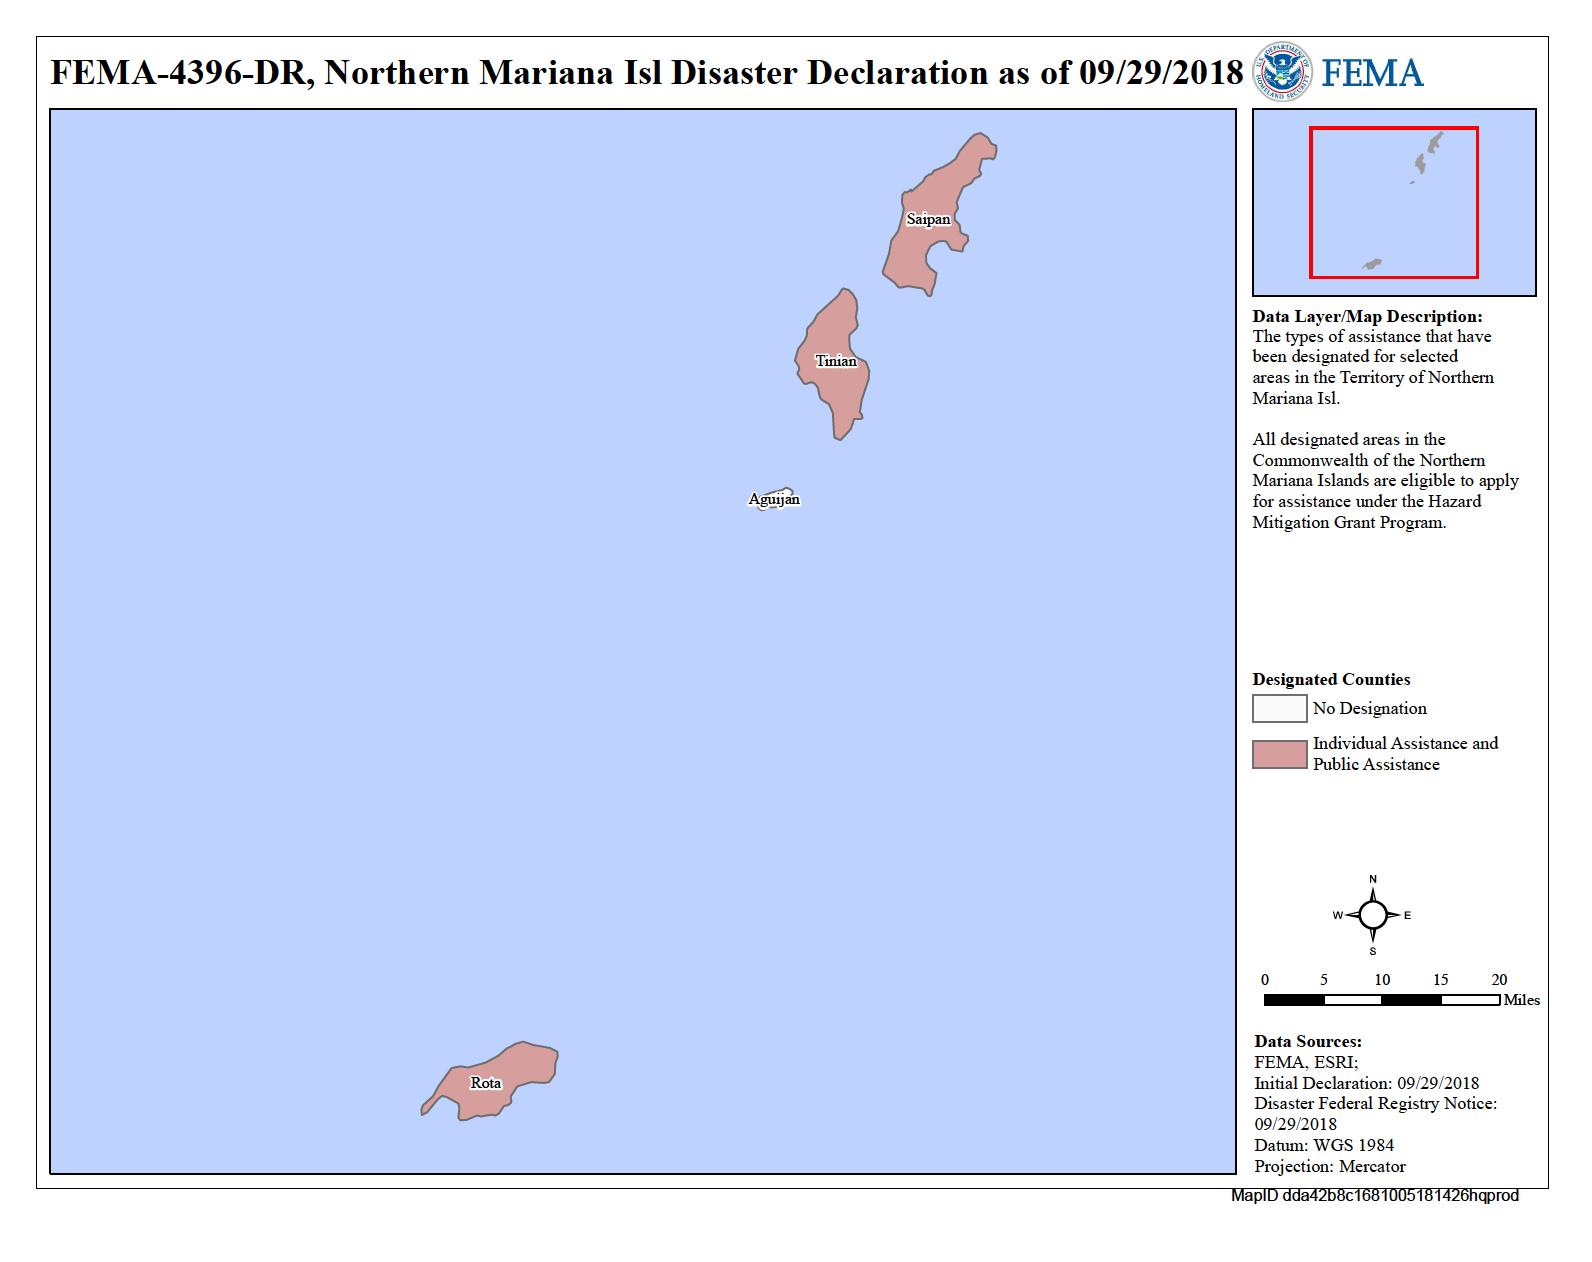 Northern Mariana Islands Typhoon Mangkhut (DR-4396) | FEMA.gov